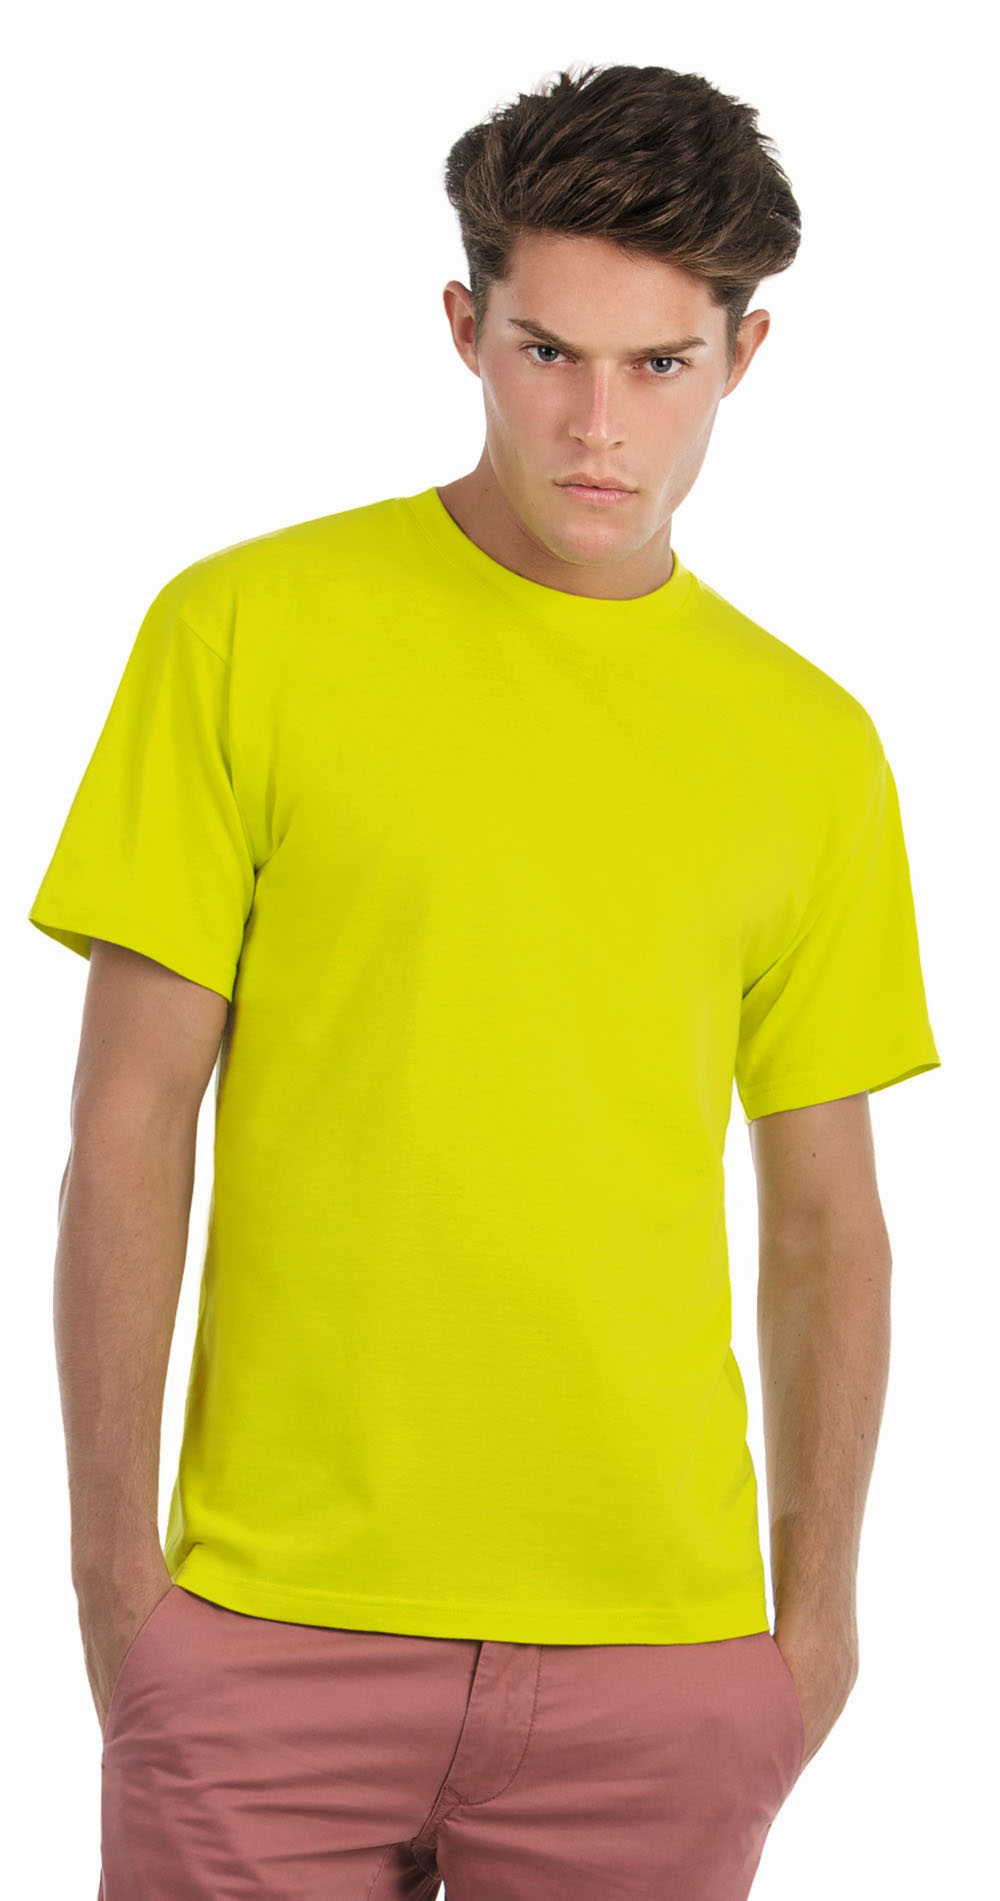 B & C Unisex Shirt verschiedene Farben Gr. XS-4XL